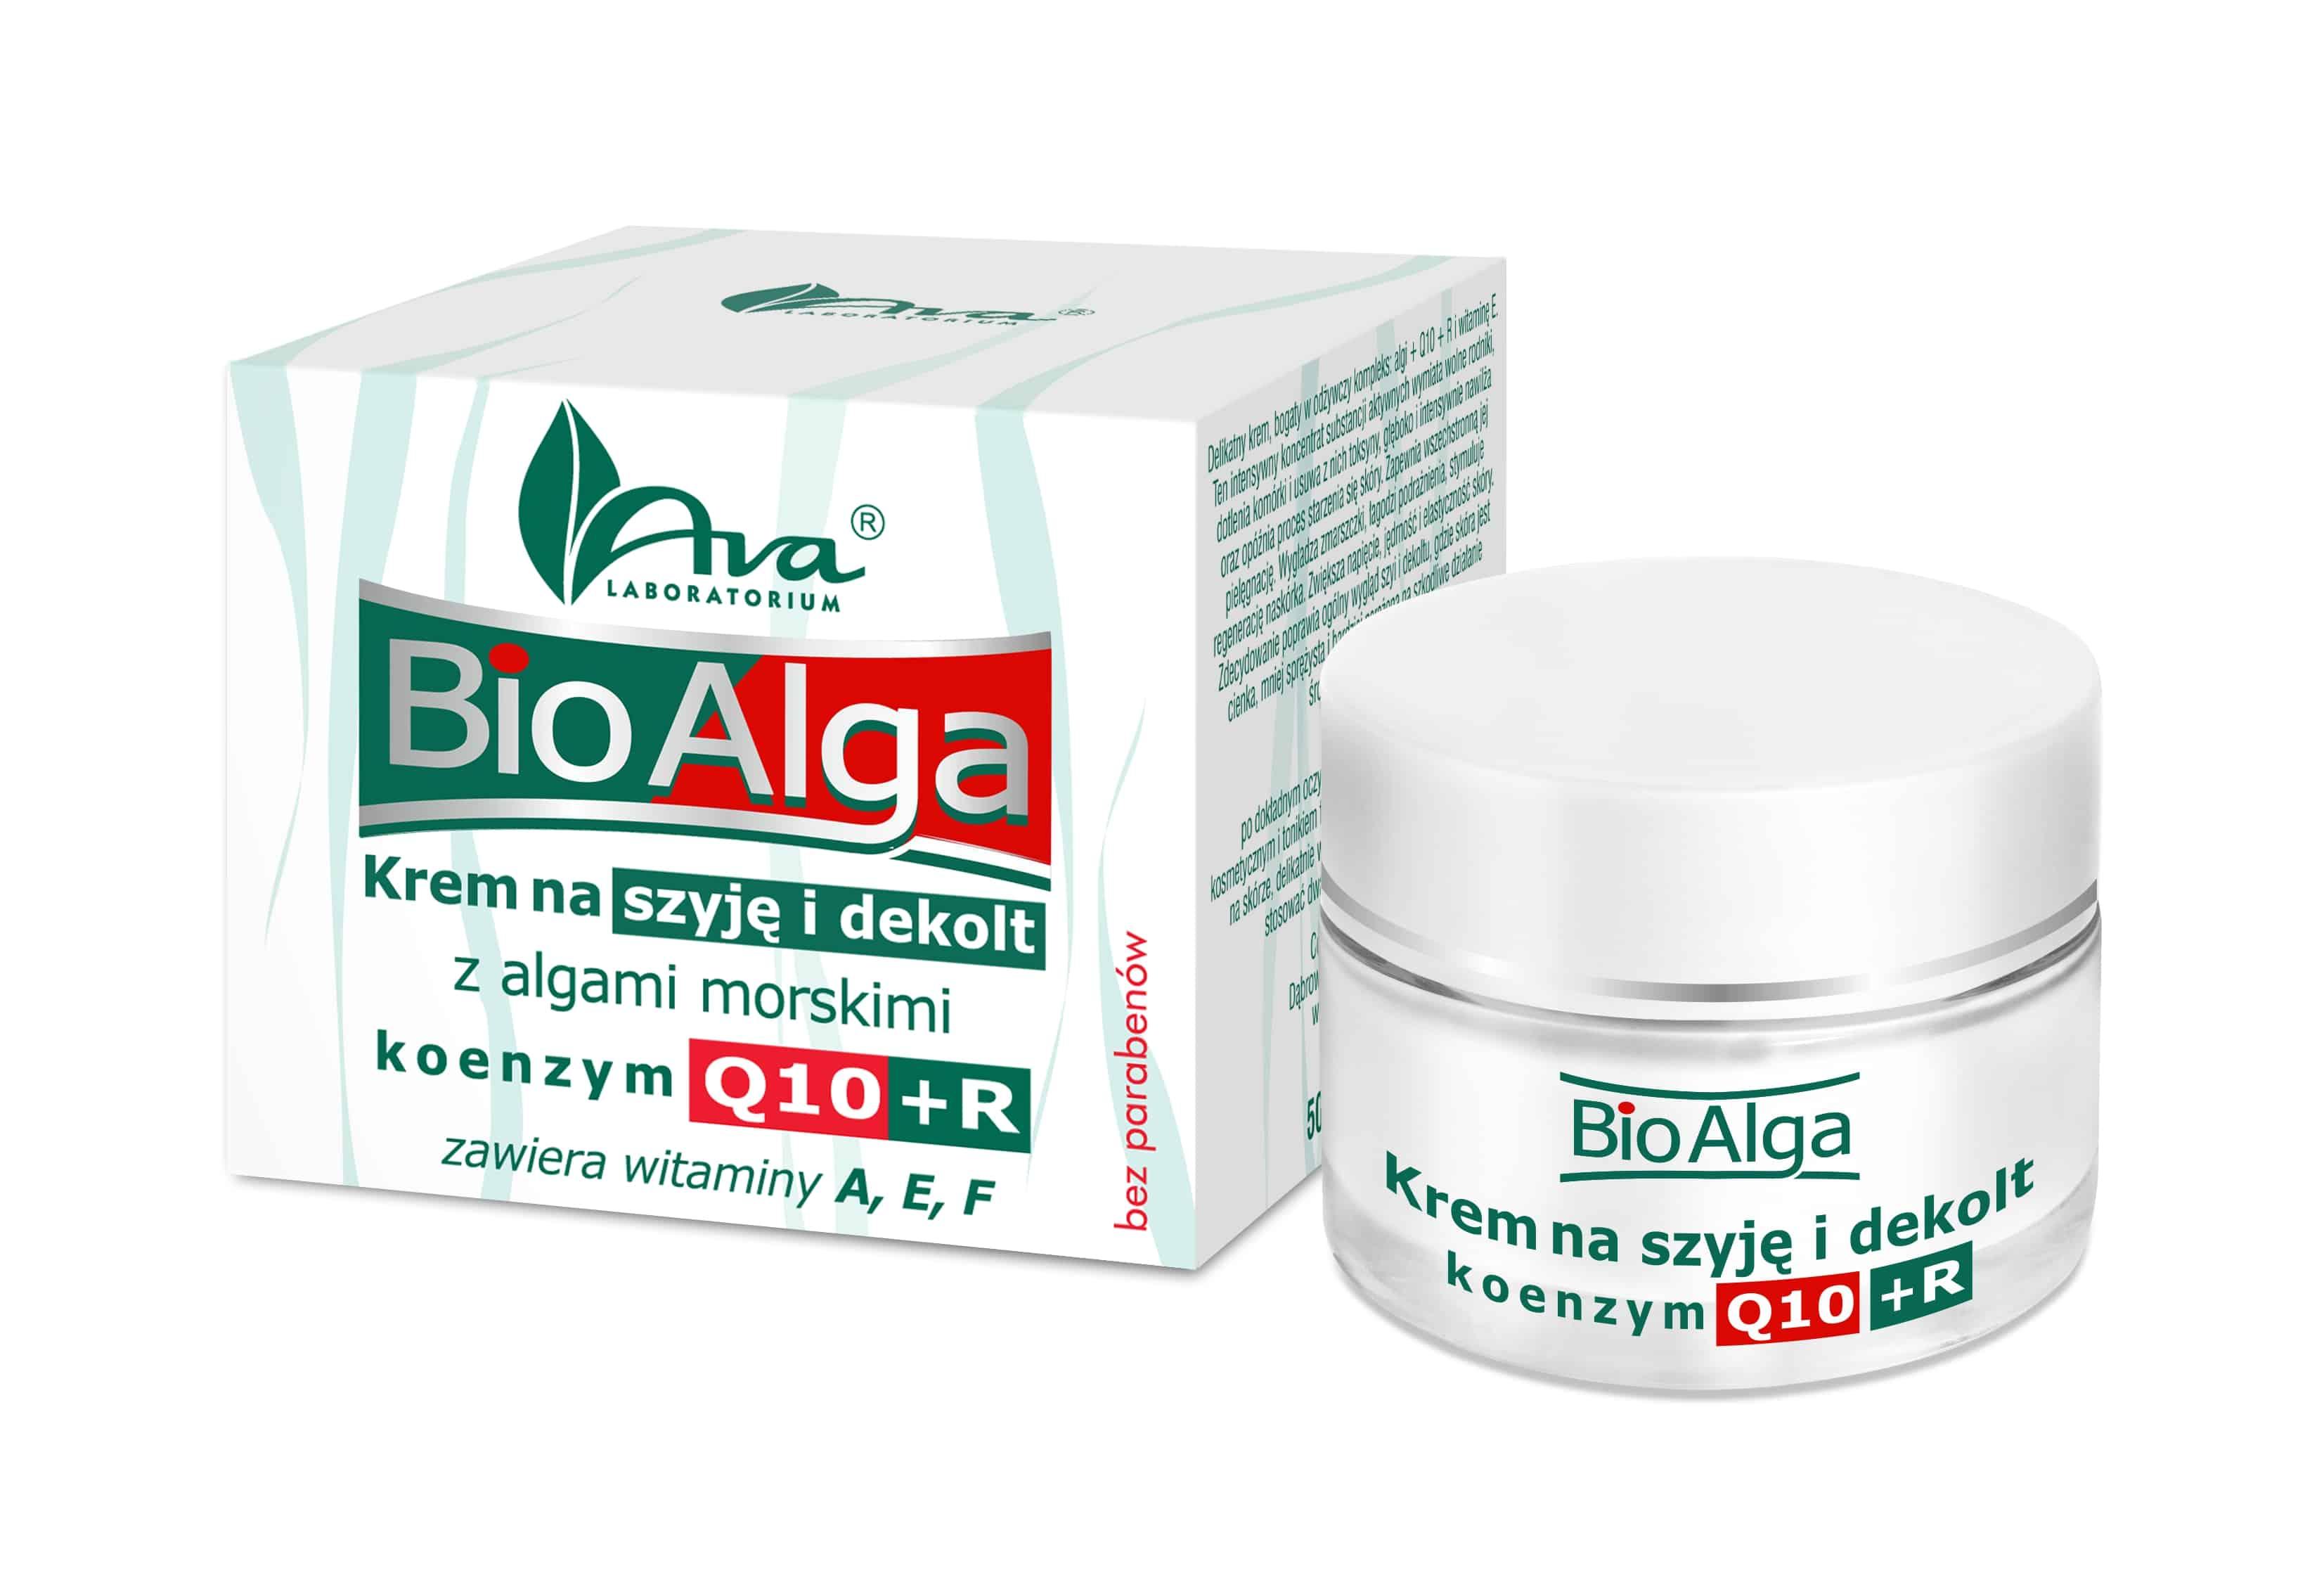 Bioalga krem szyja_PL